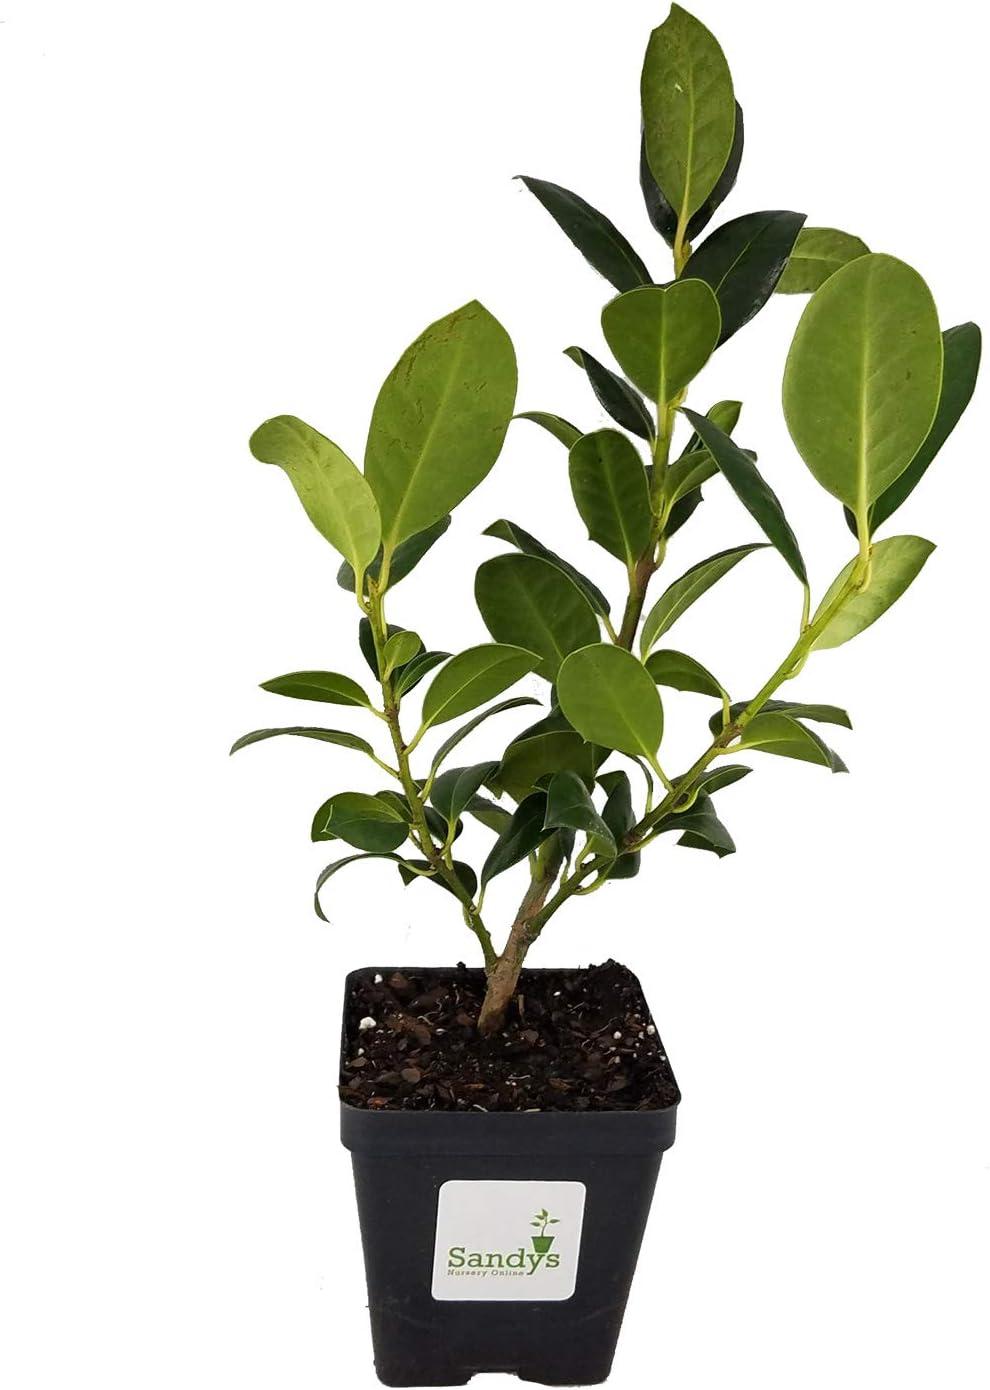 Sandys Nursery Online Ilex Evergreen Shrub, Nellie R Stevens Holly Dark Green Leaves, 4 Inch Pot